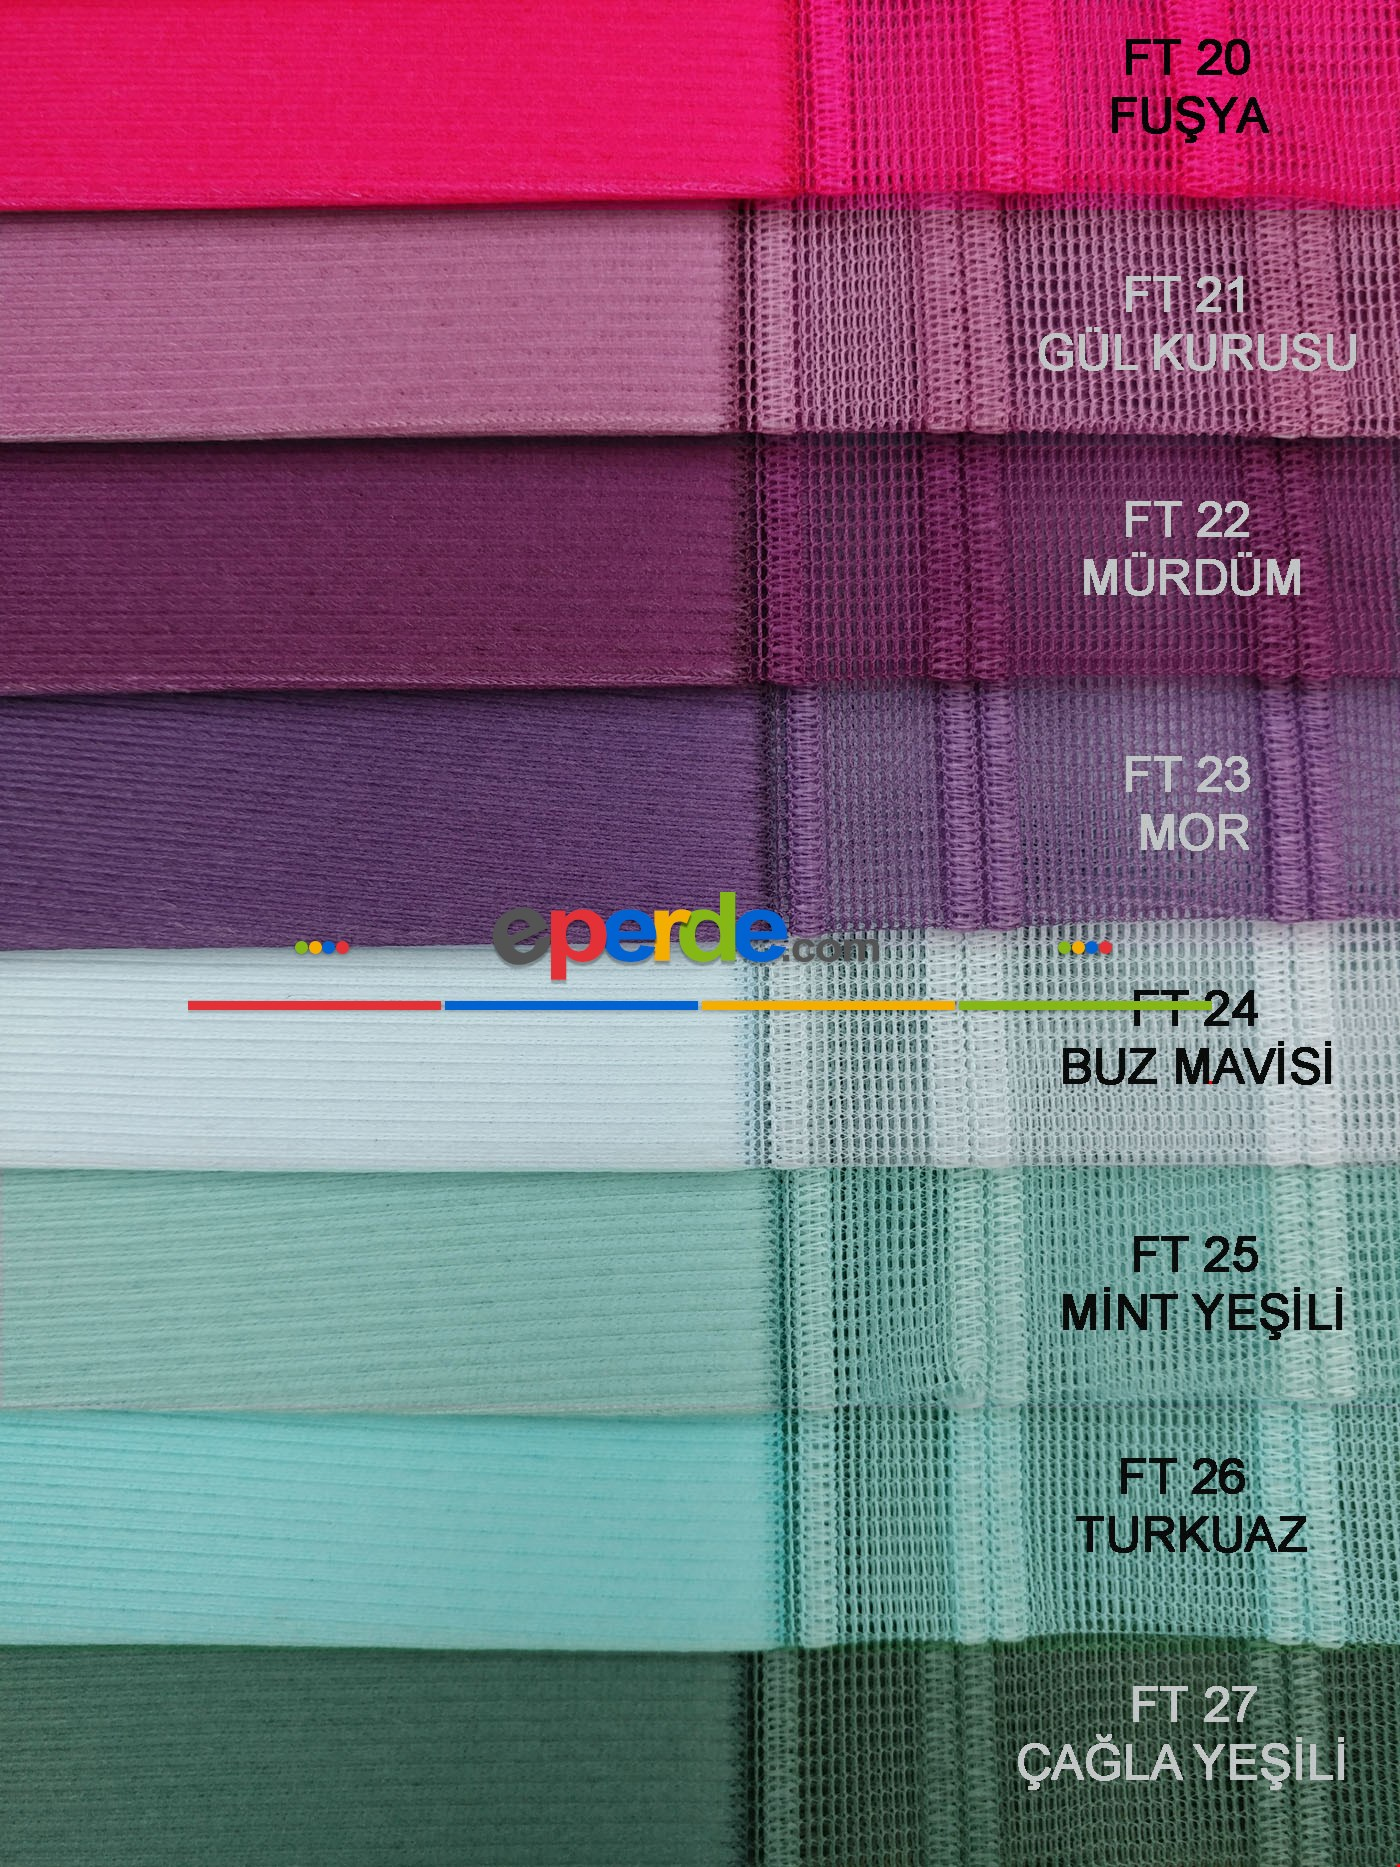 1. Kalite Çizgili Tül Dikey Zebra Perde - Ft-33 Parlament , Ft-31 Okyanus , Ft-26 Turkuaz , Ft-02 Ekru